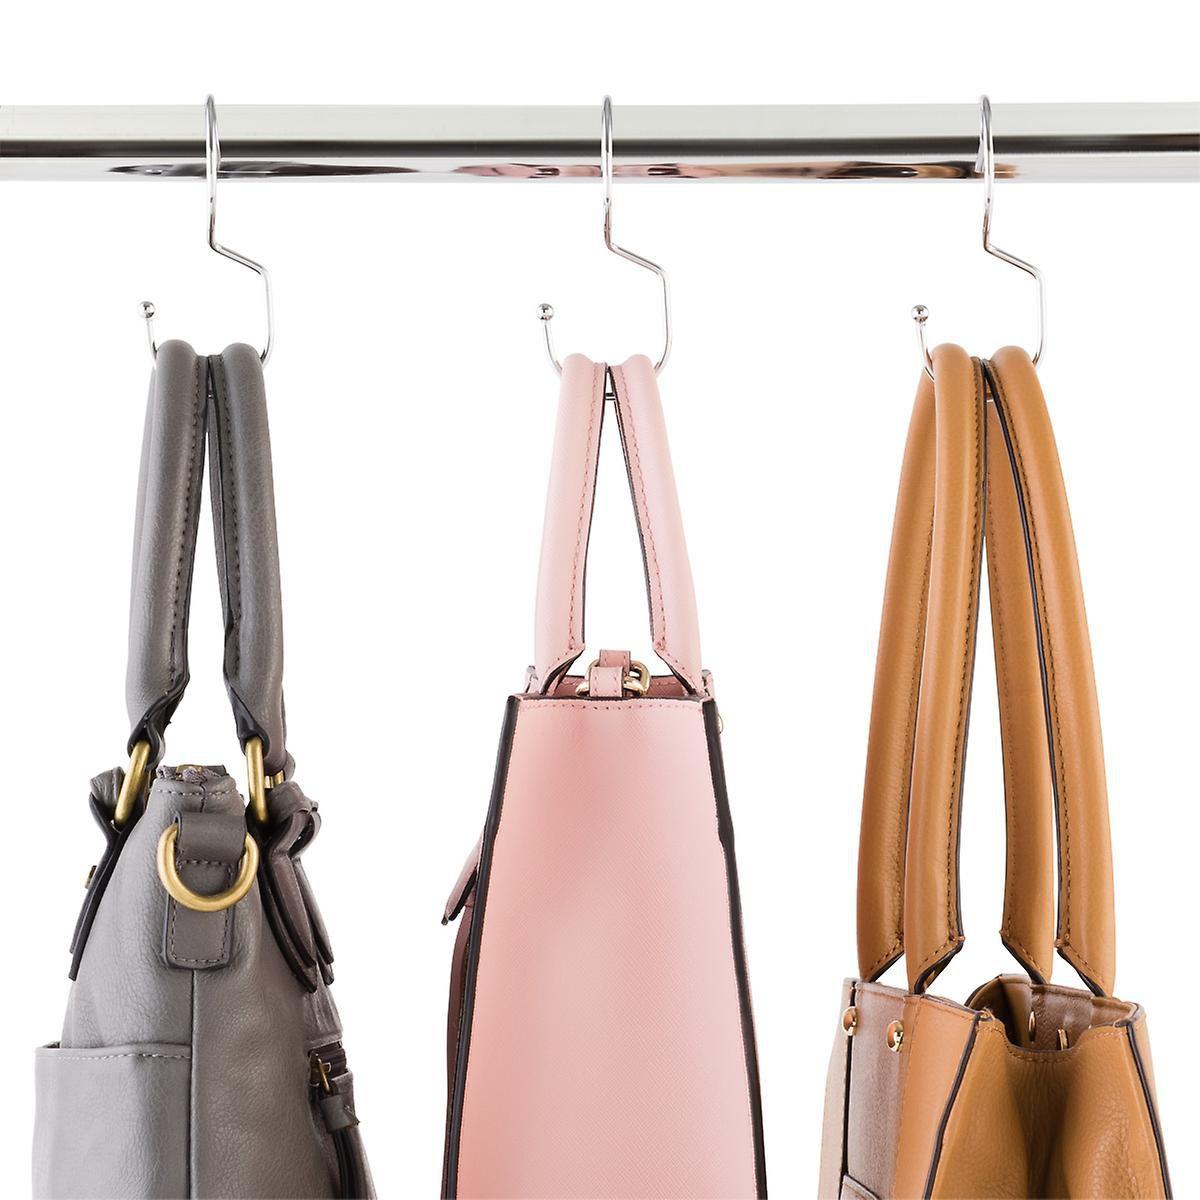 Tote bag hangers